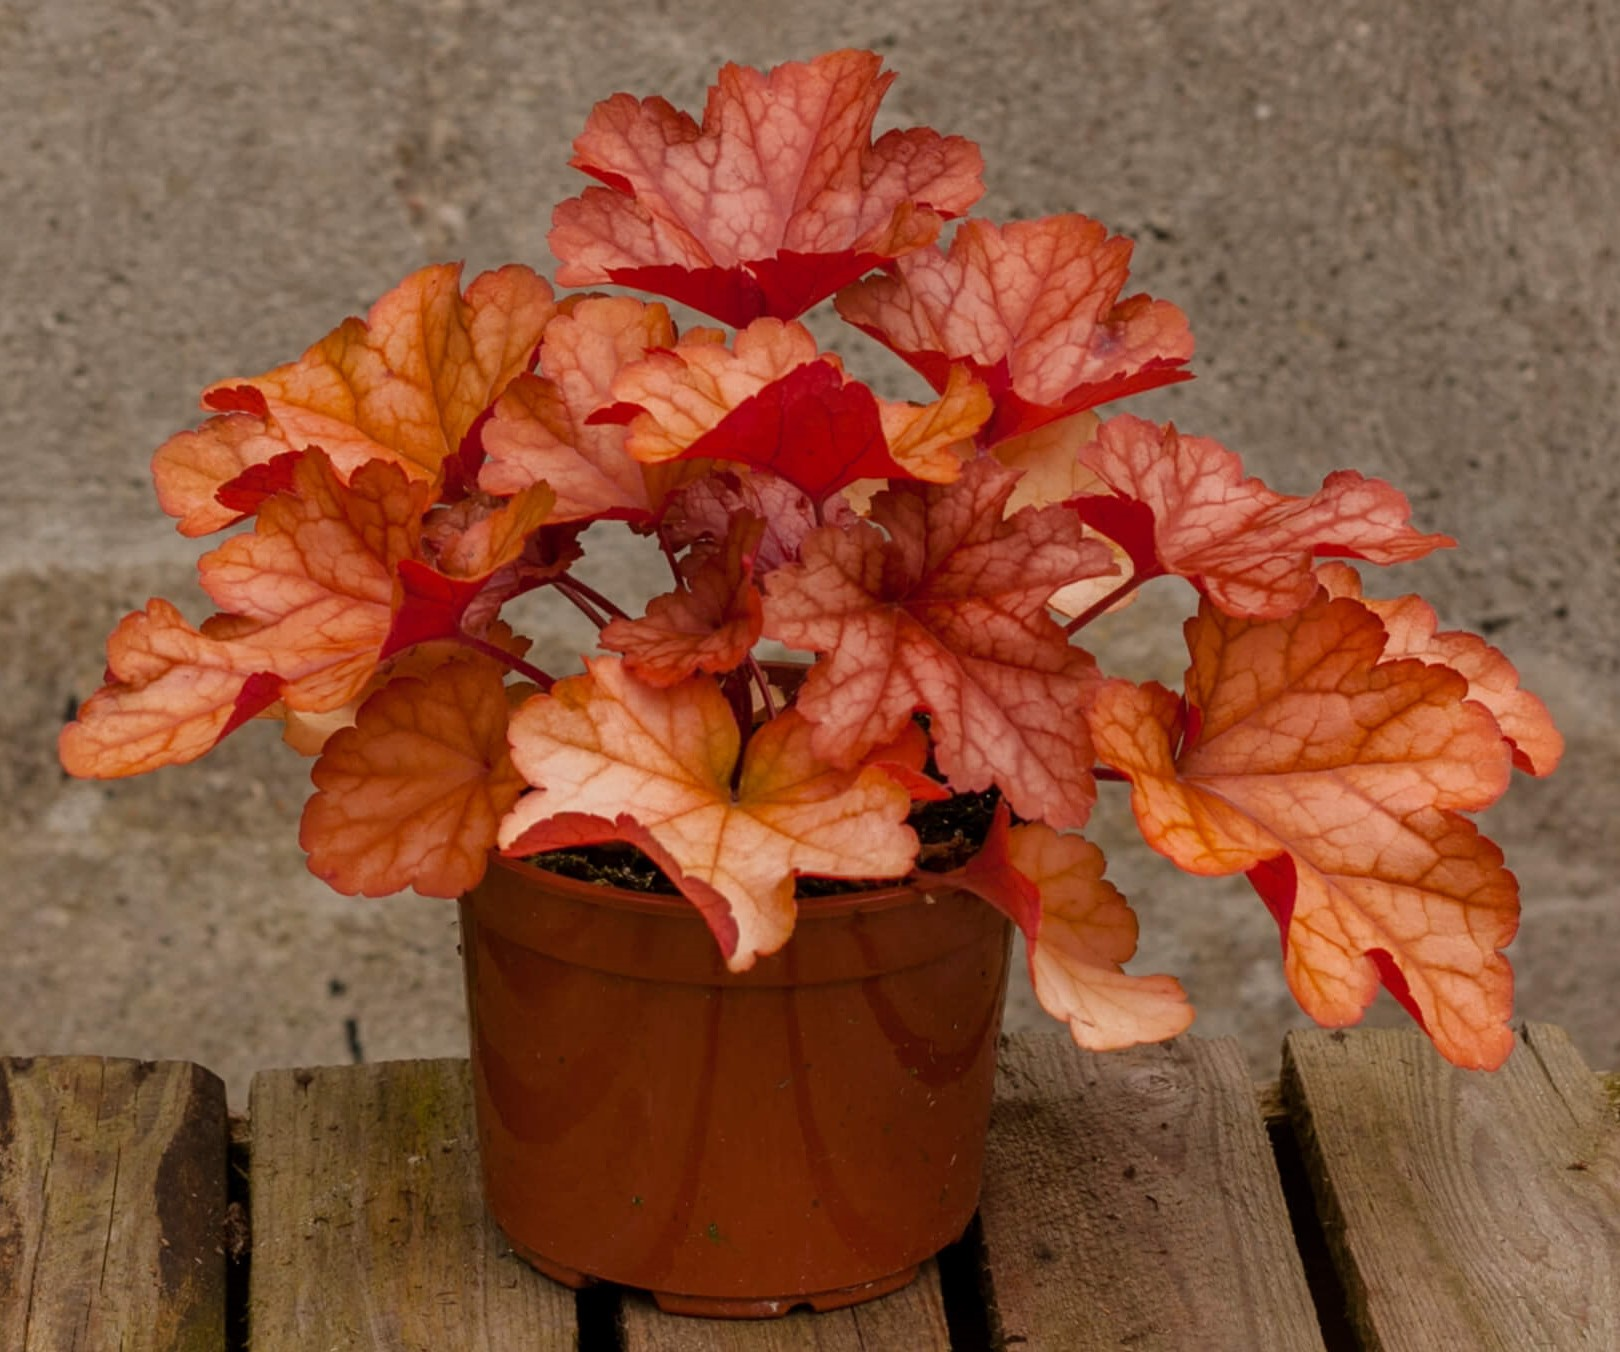 Purpurglöckchen (Heuchera) 'Paprika' T12, orange - winterhart -